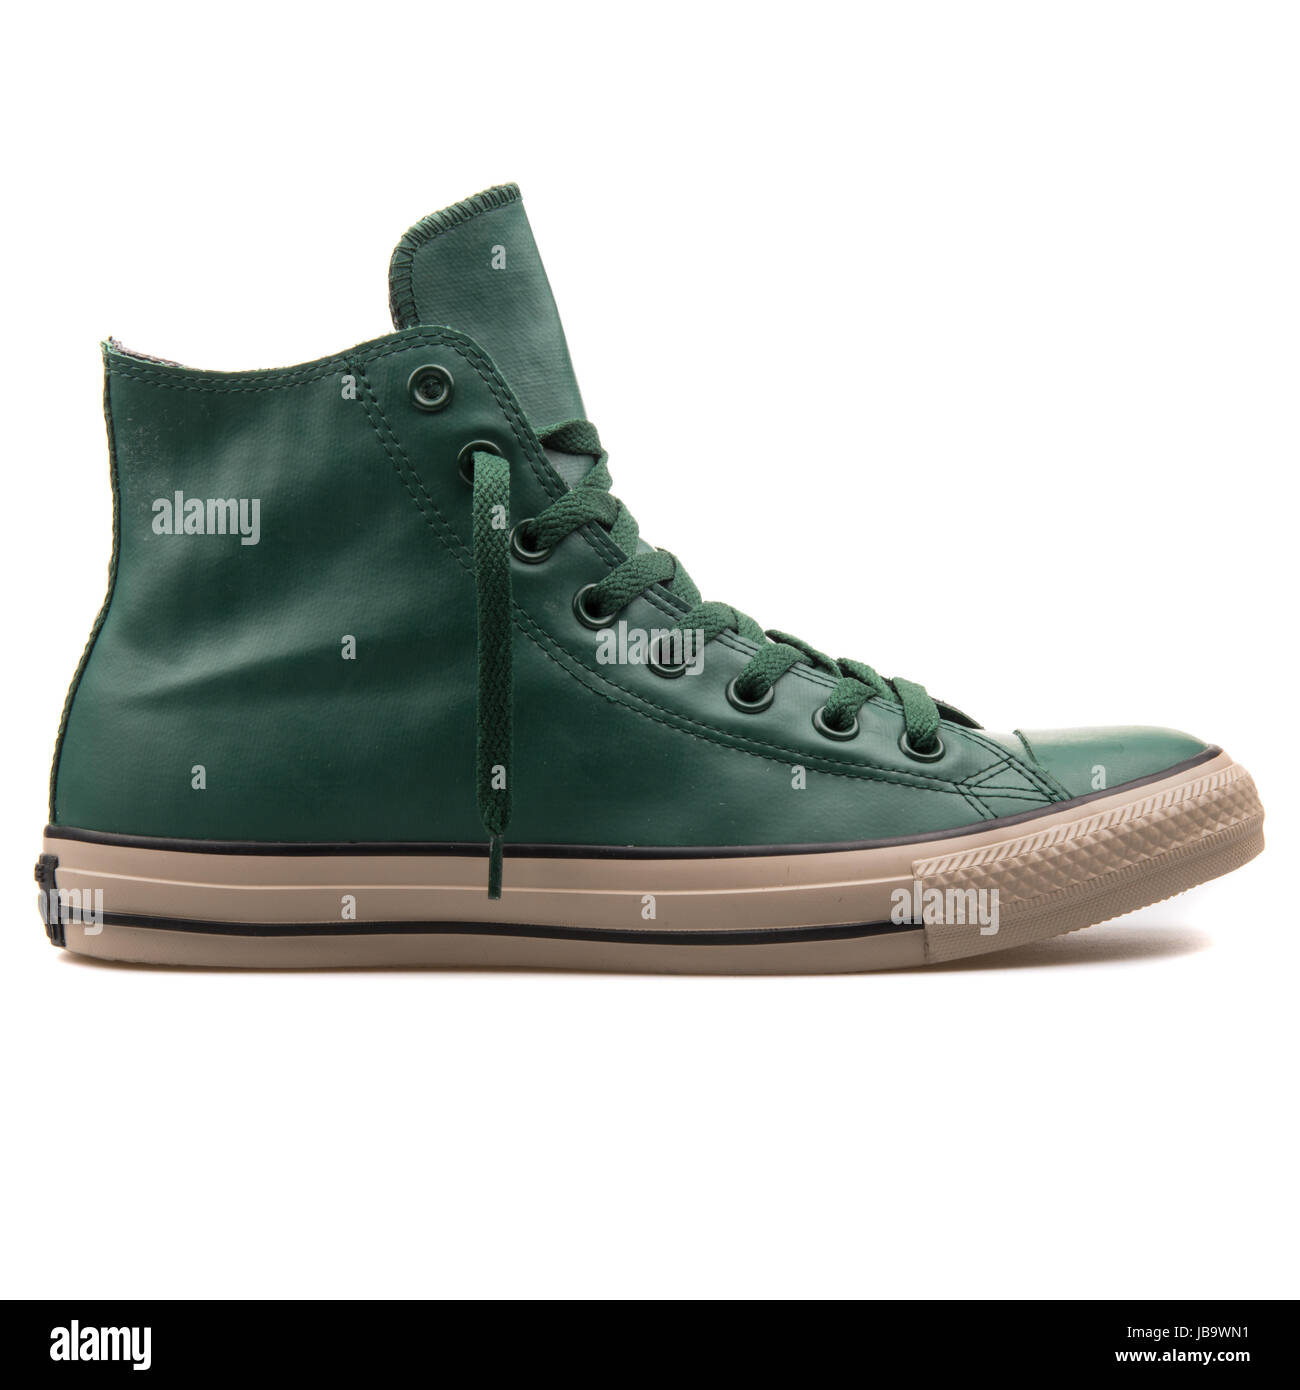 Converse Chuck Taylor All Star HI Gloom verde scarpe Unisex